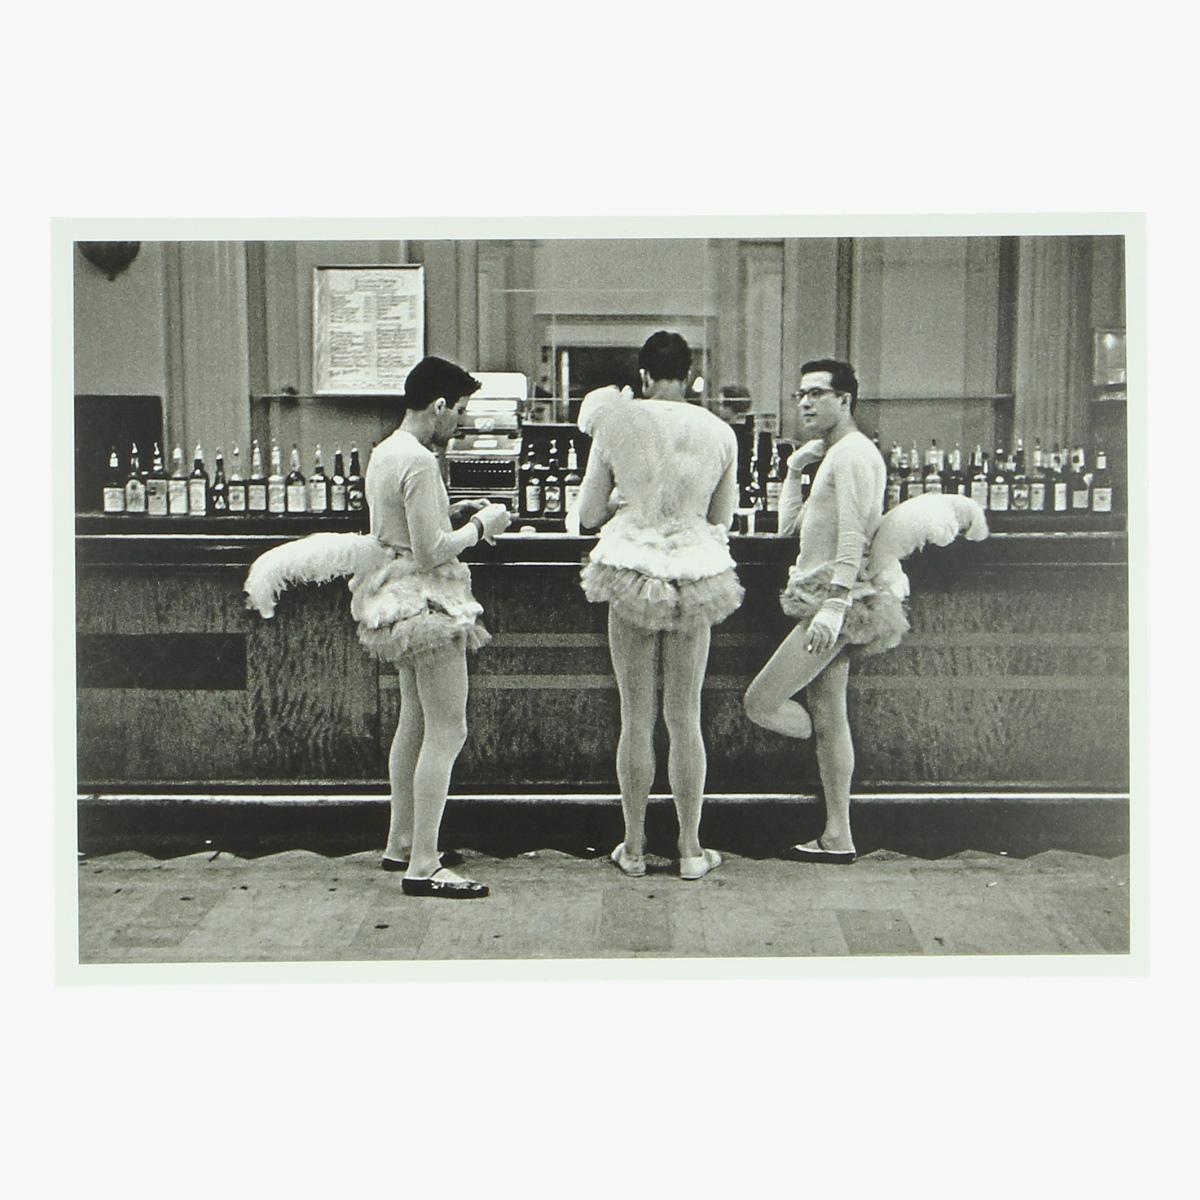 Afbeeldingen van postkaart Elliott /magnum photos usa NY city 1956 repro